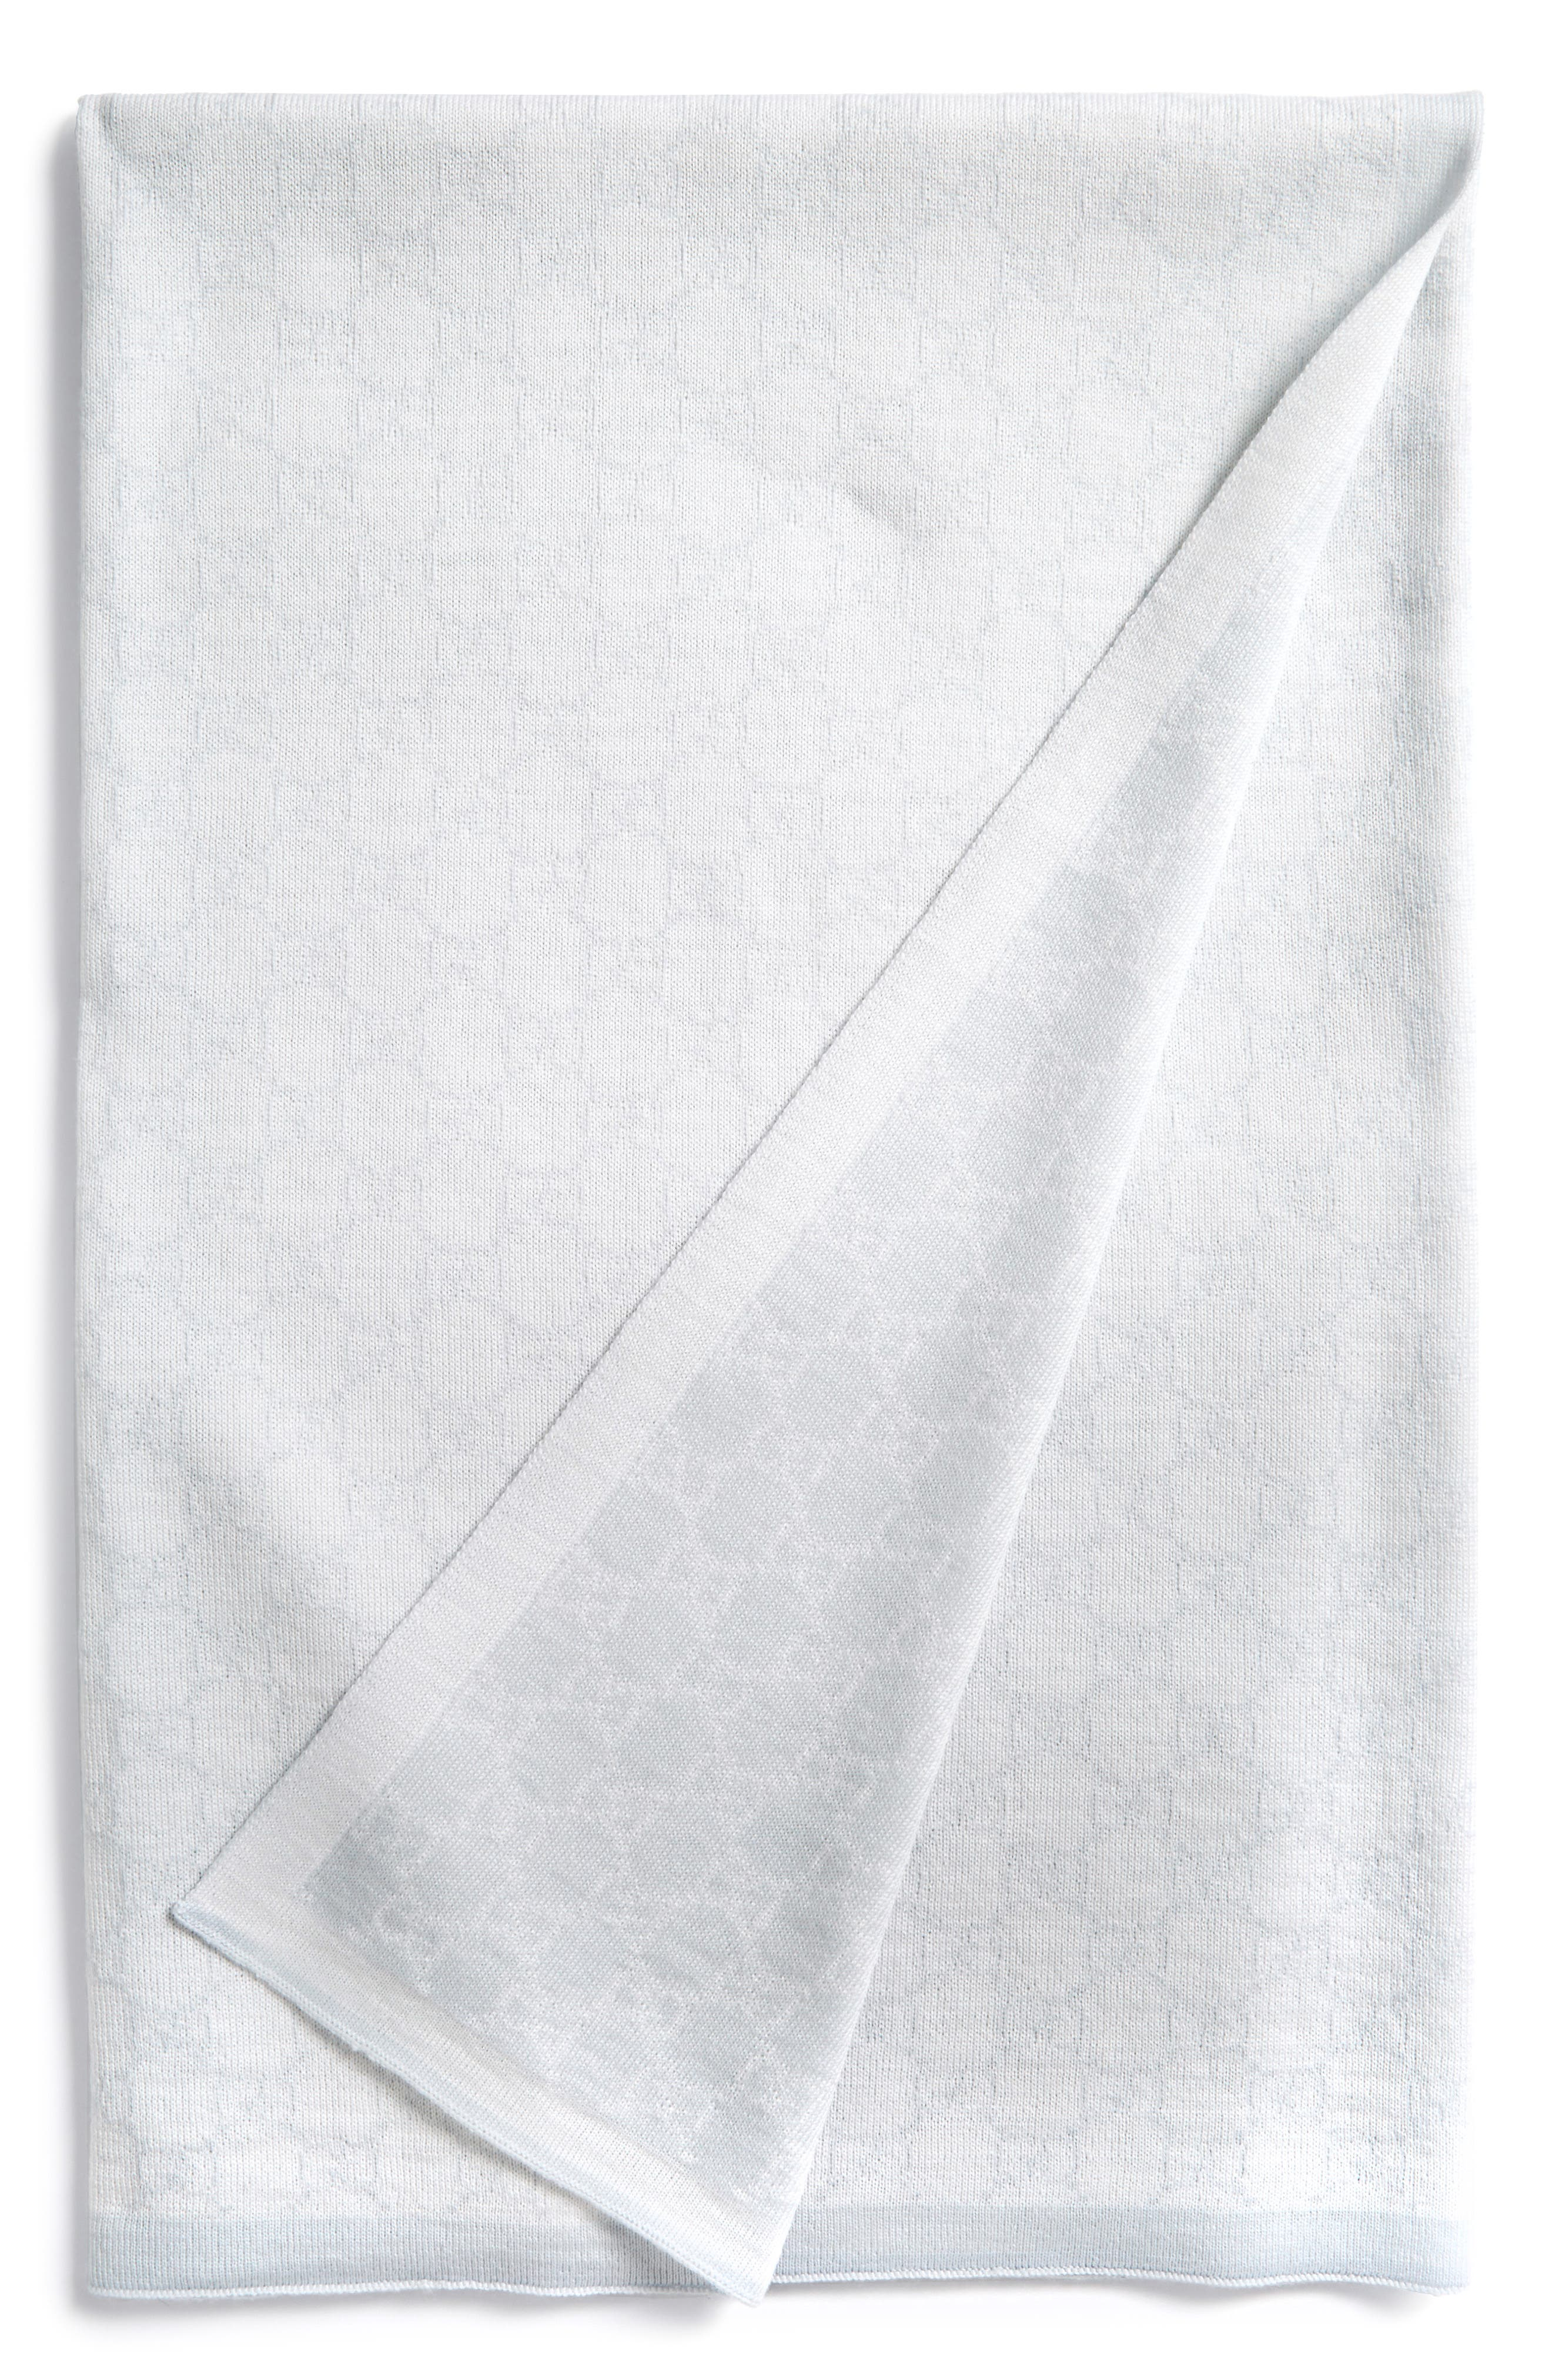 Wool Baby Blanket,                         Main,                         color, IVORY/ SKY BLUE